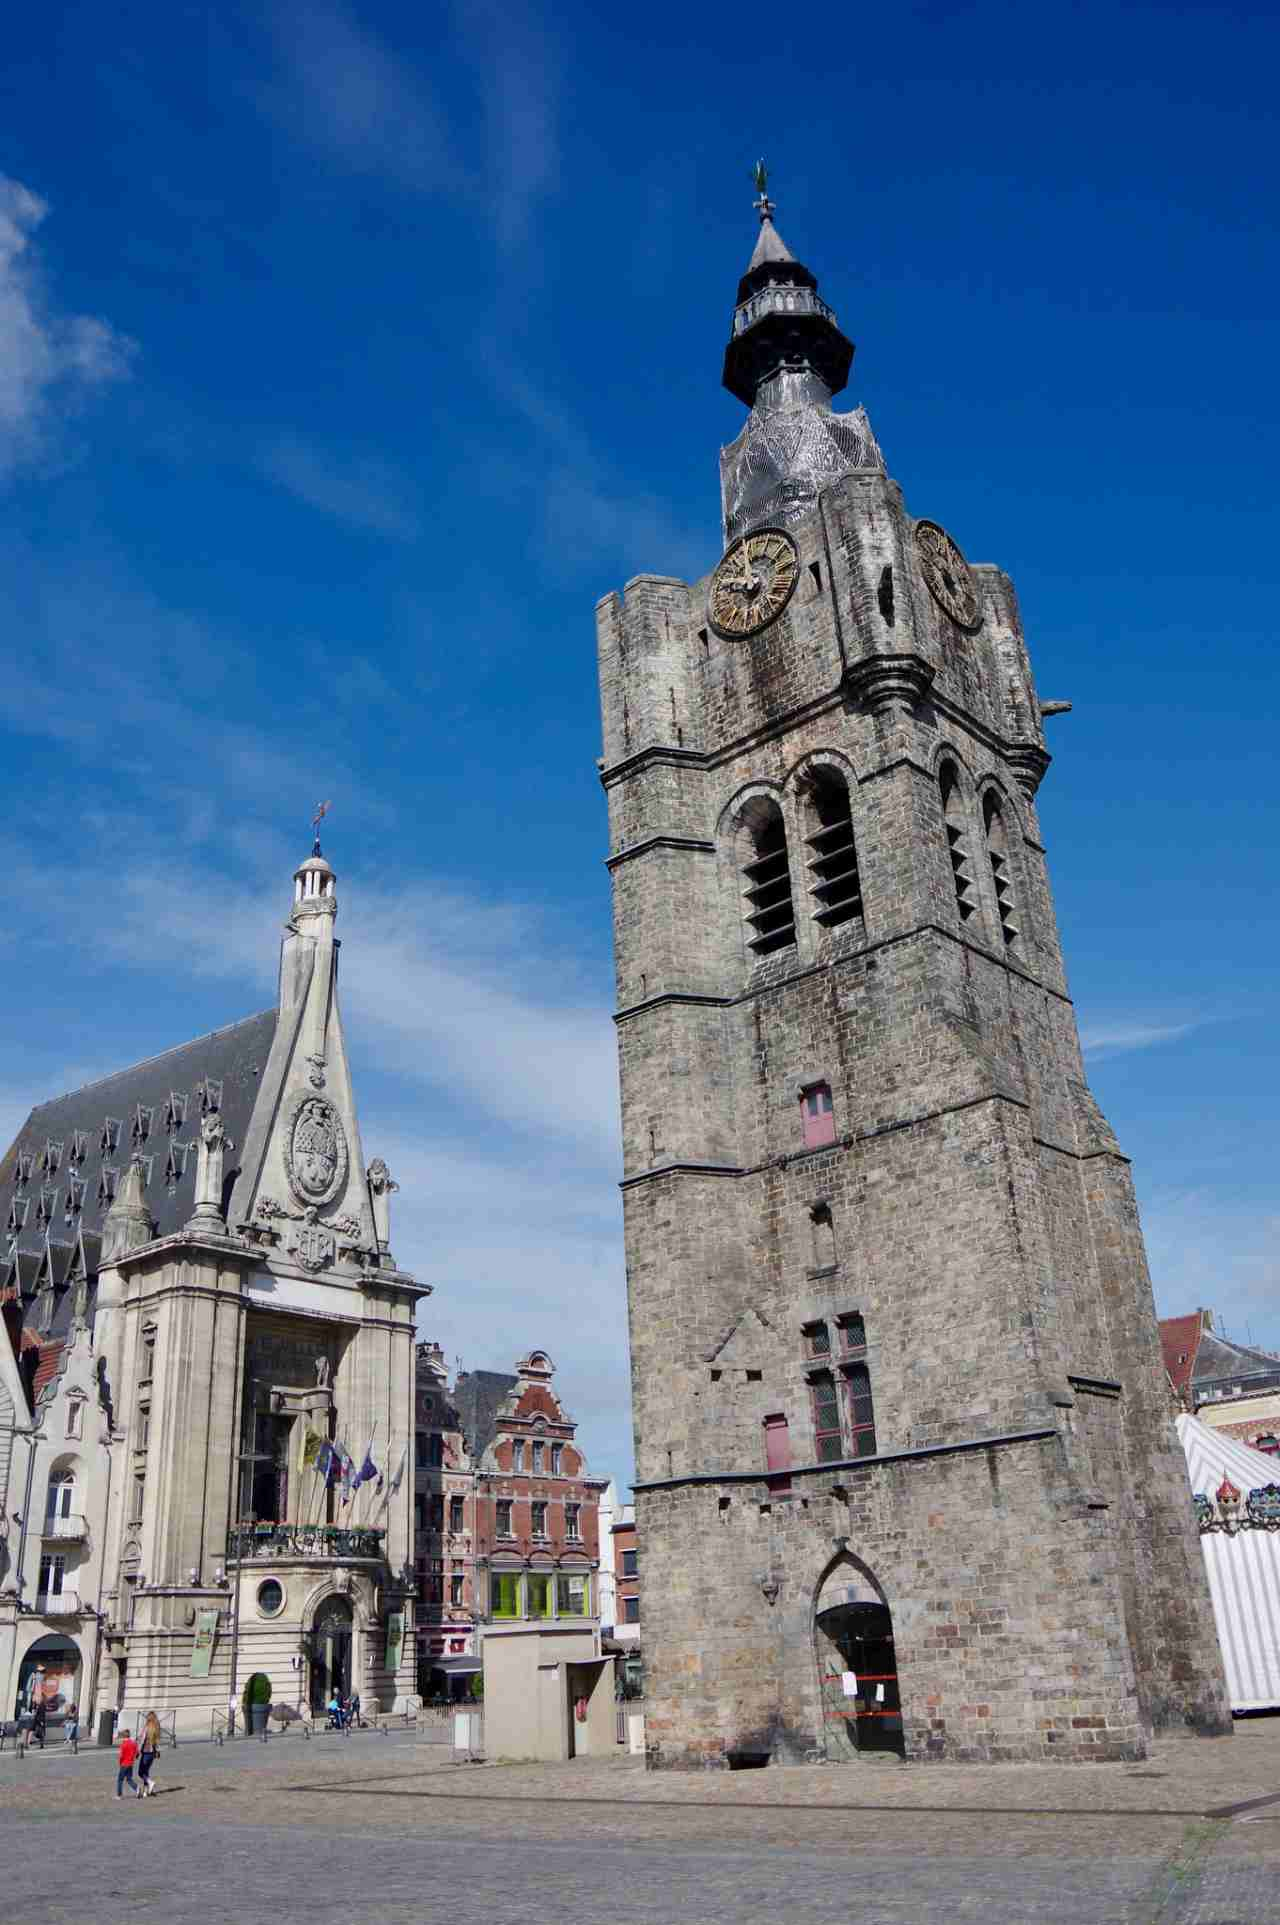 Belfries of Belgium and France, Béthune, Pas-de-Calais, Unesco France